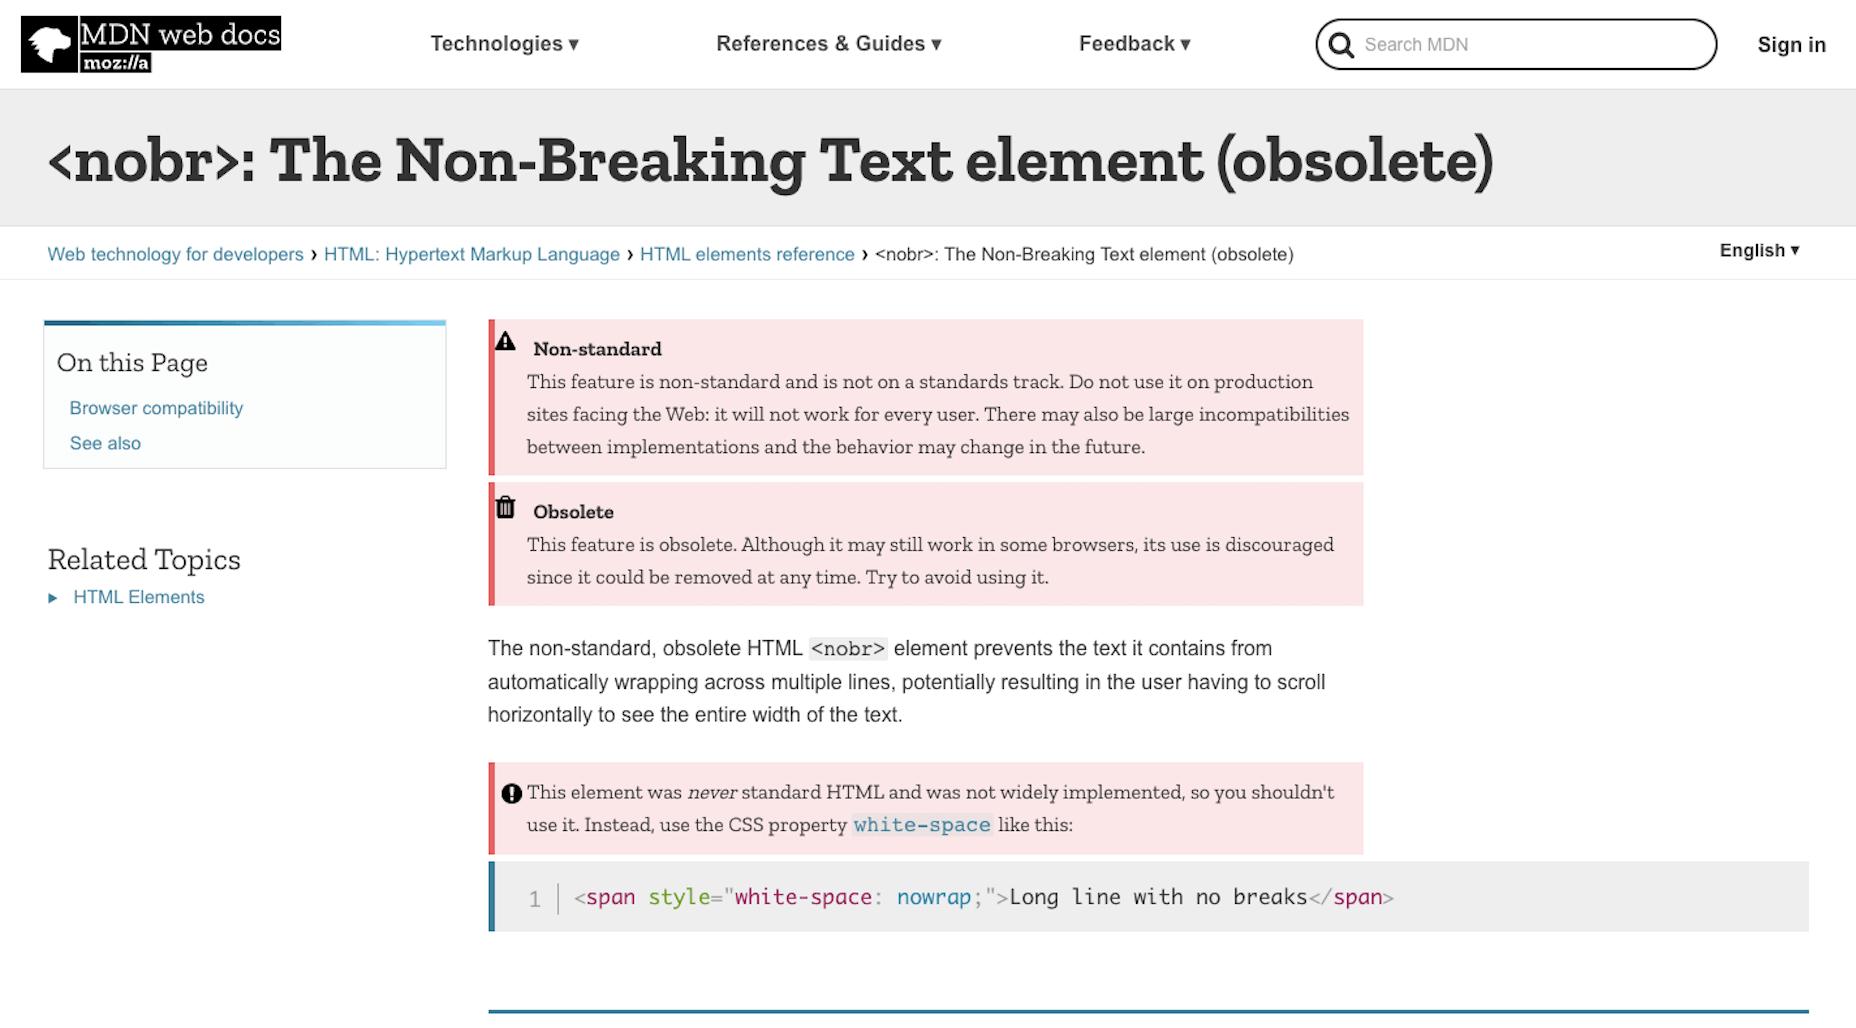 Mozilla Warning About nobr